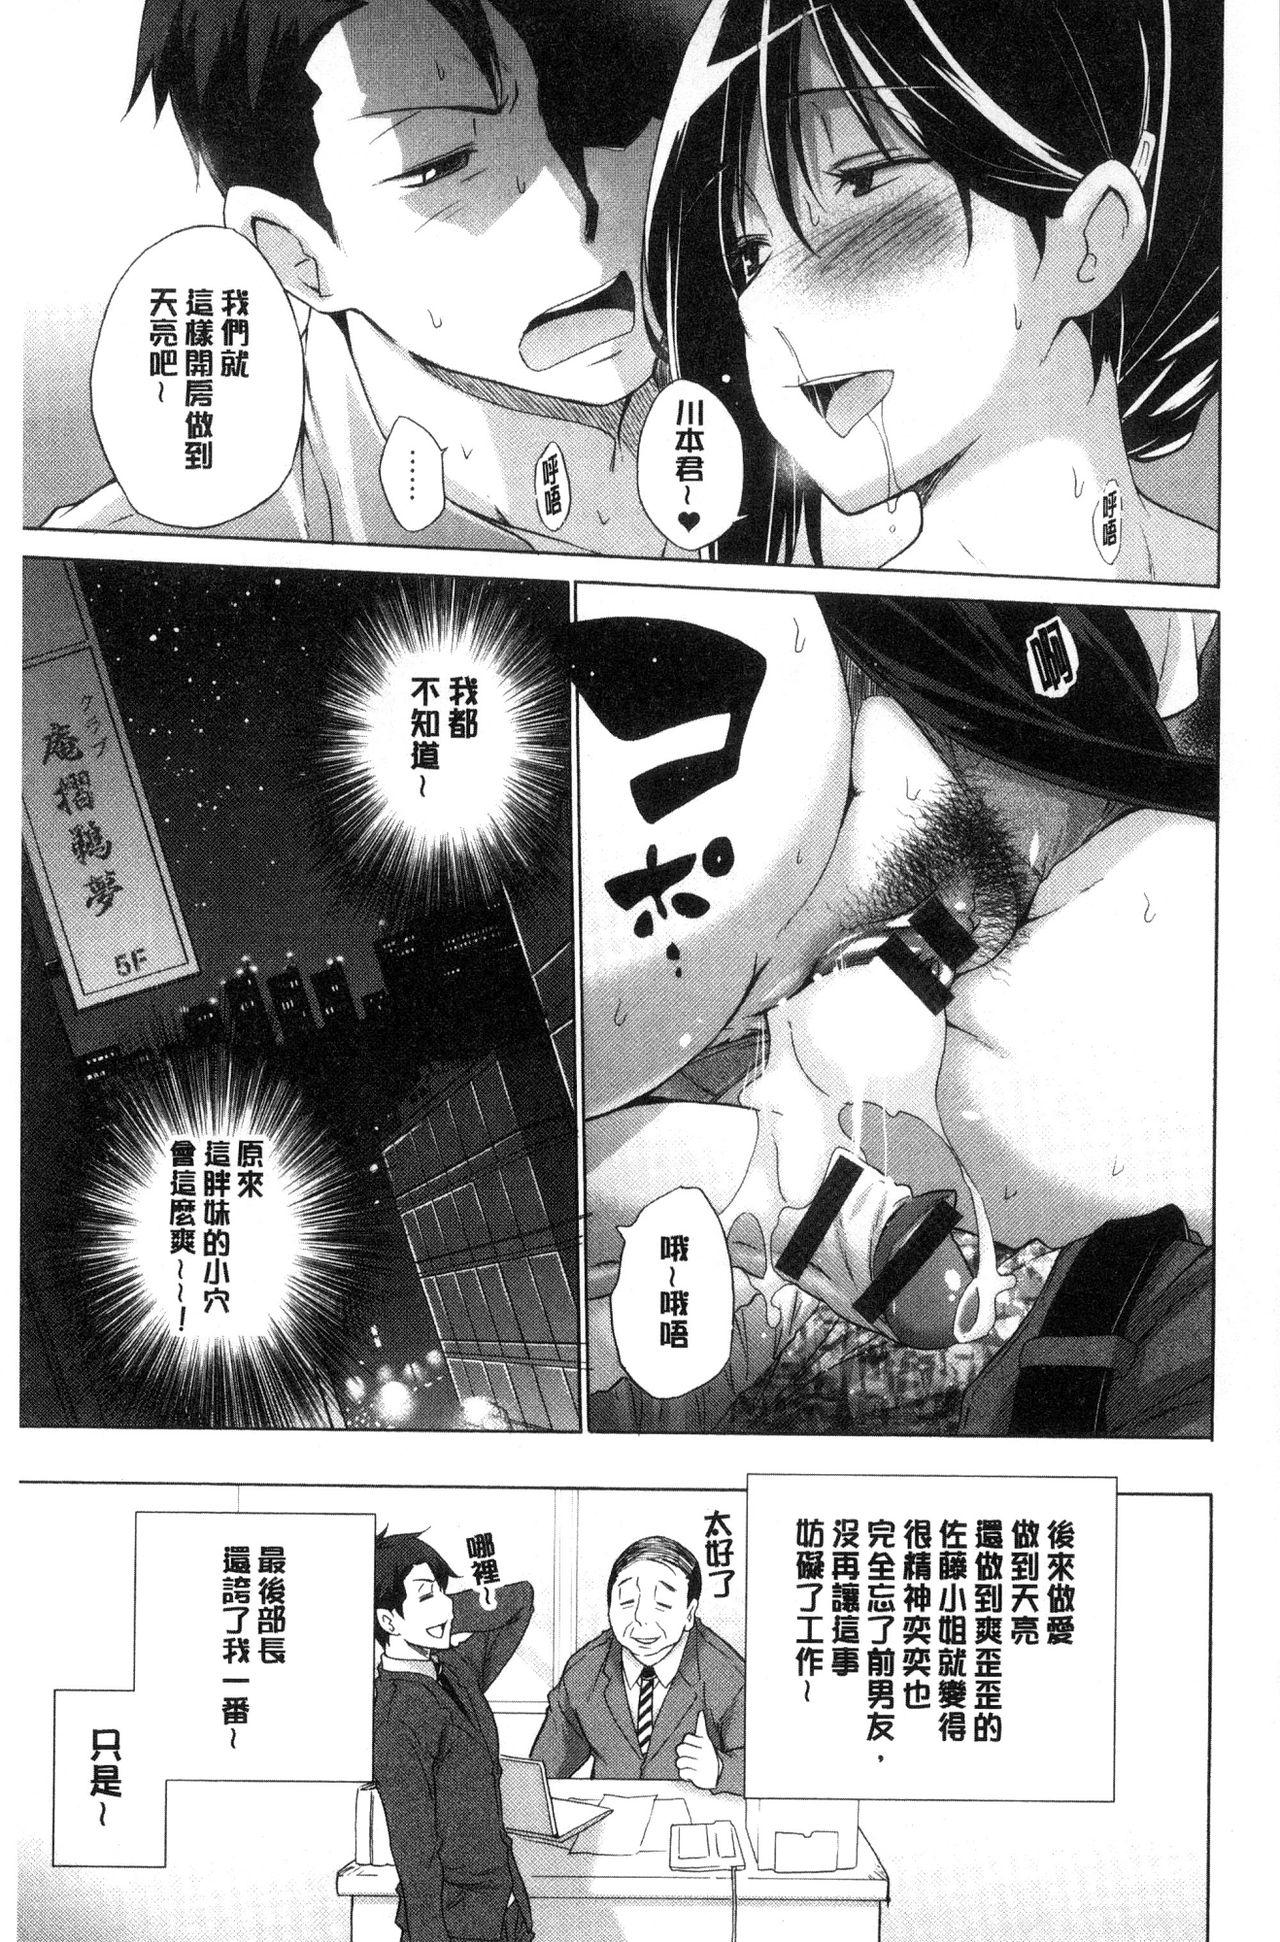 [Miyano Kintarou] Hishoujo List - The Non-Virgin List  | 非處女的名單 [Chinese] 188